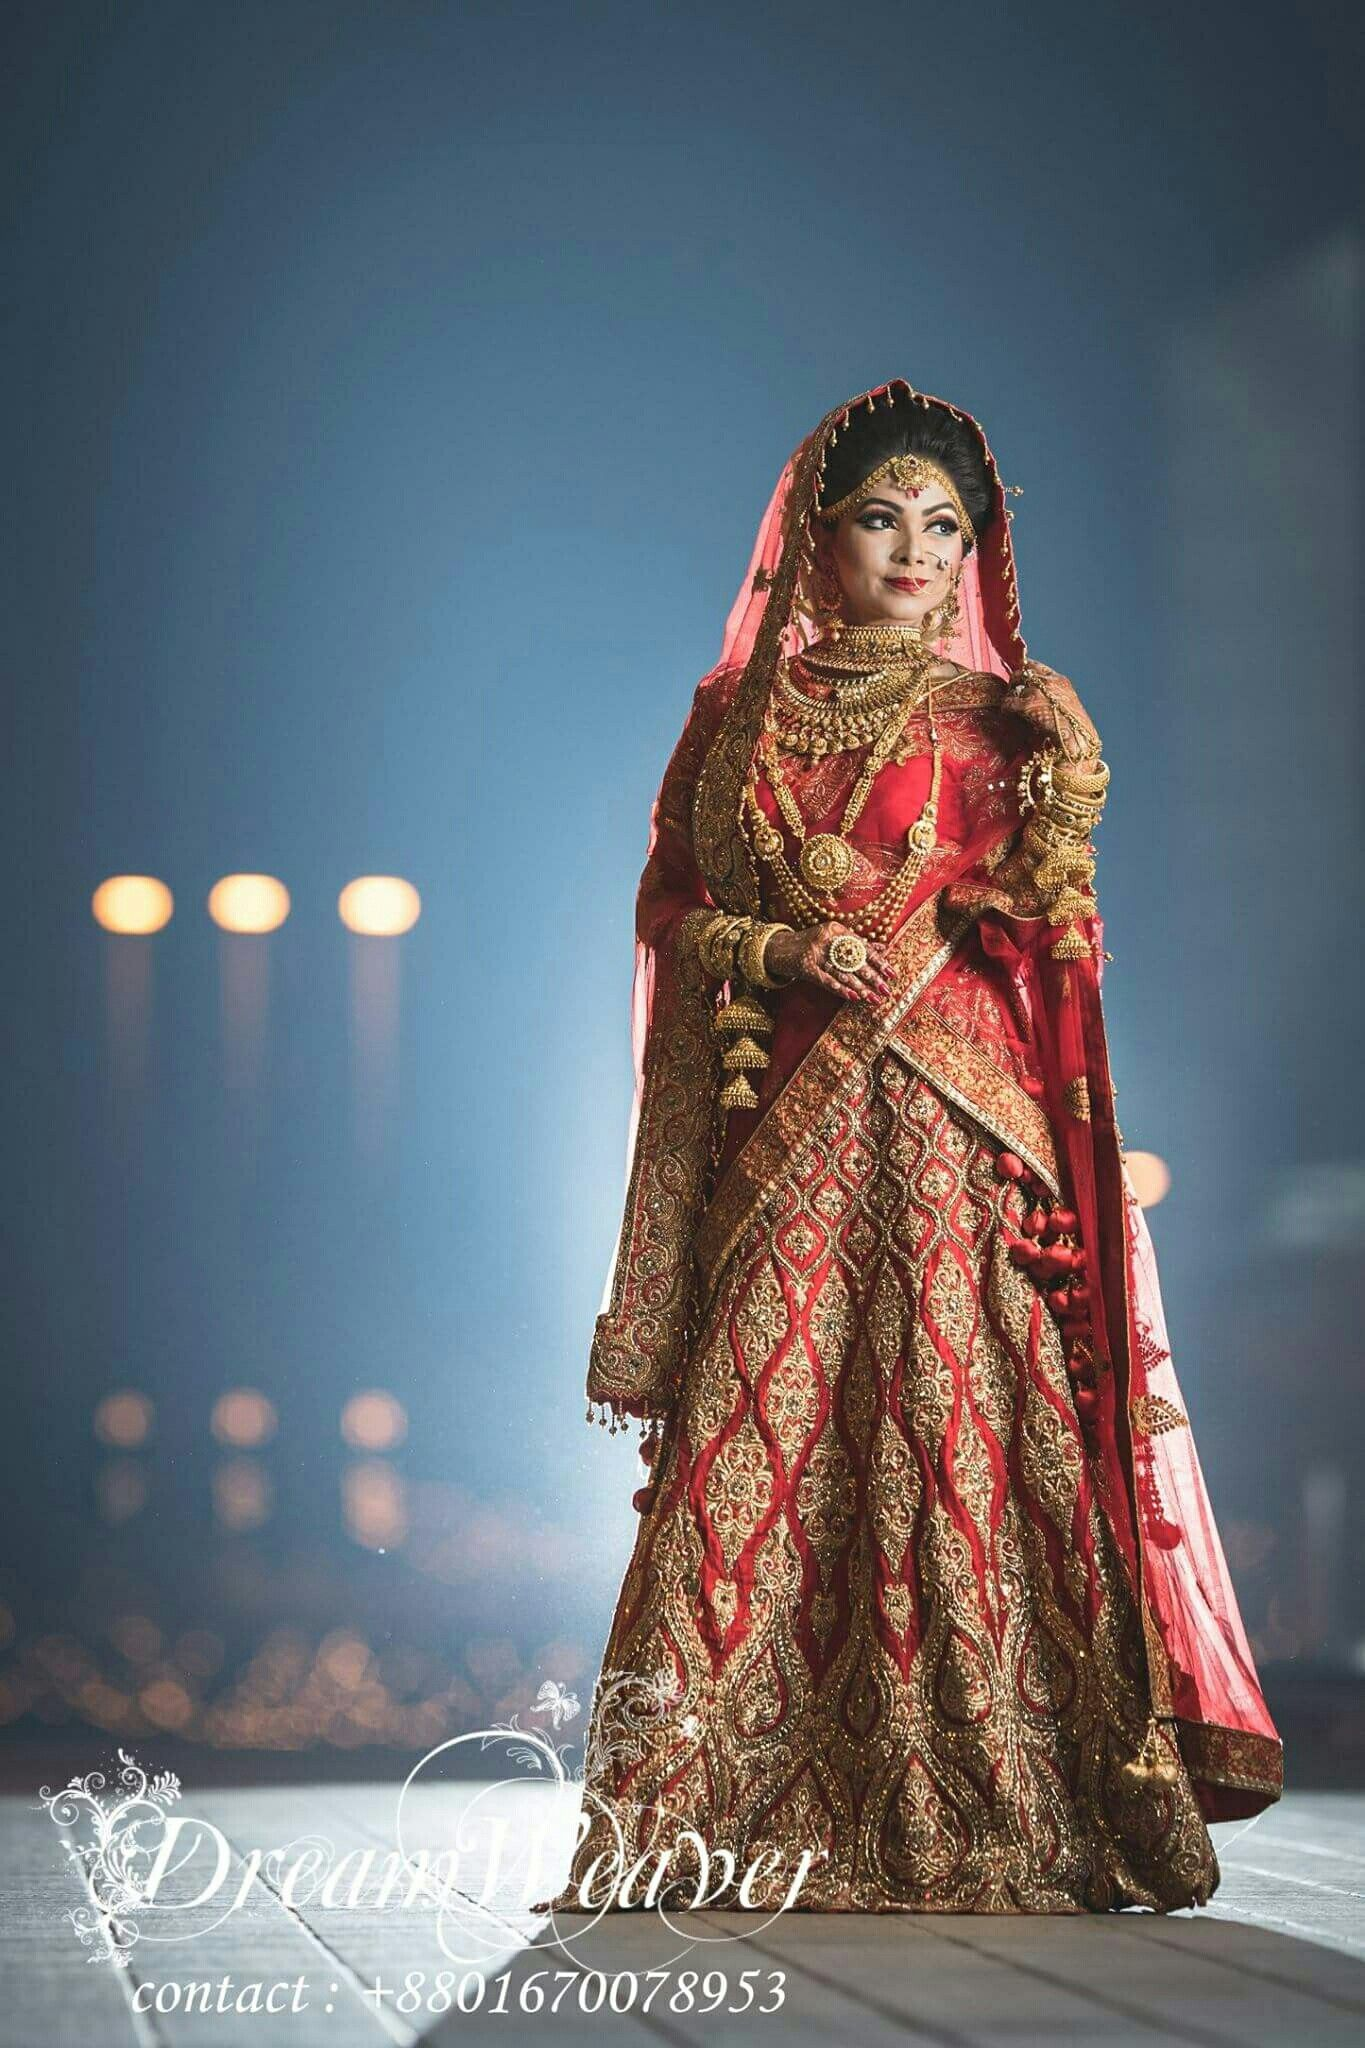 Pin by Bambhaniya Kajal on mahi style ((Bridal)) | Pinterest ...